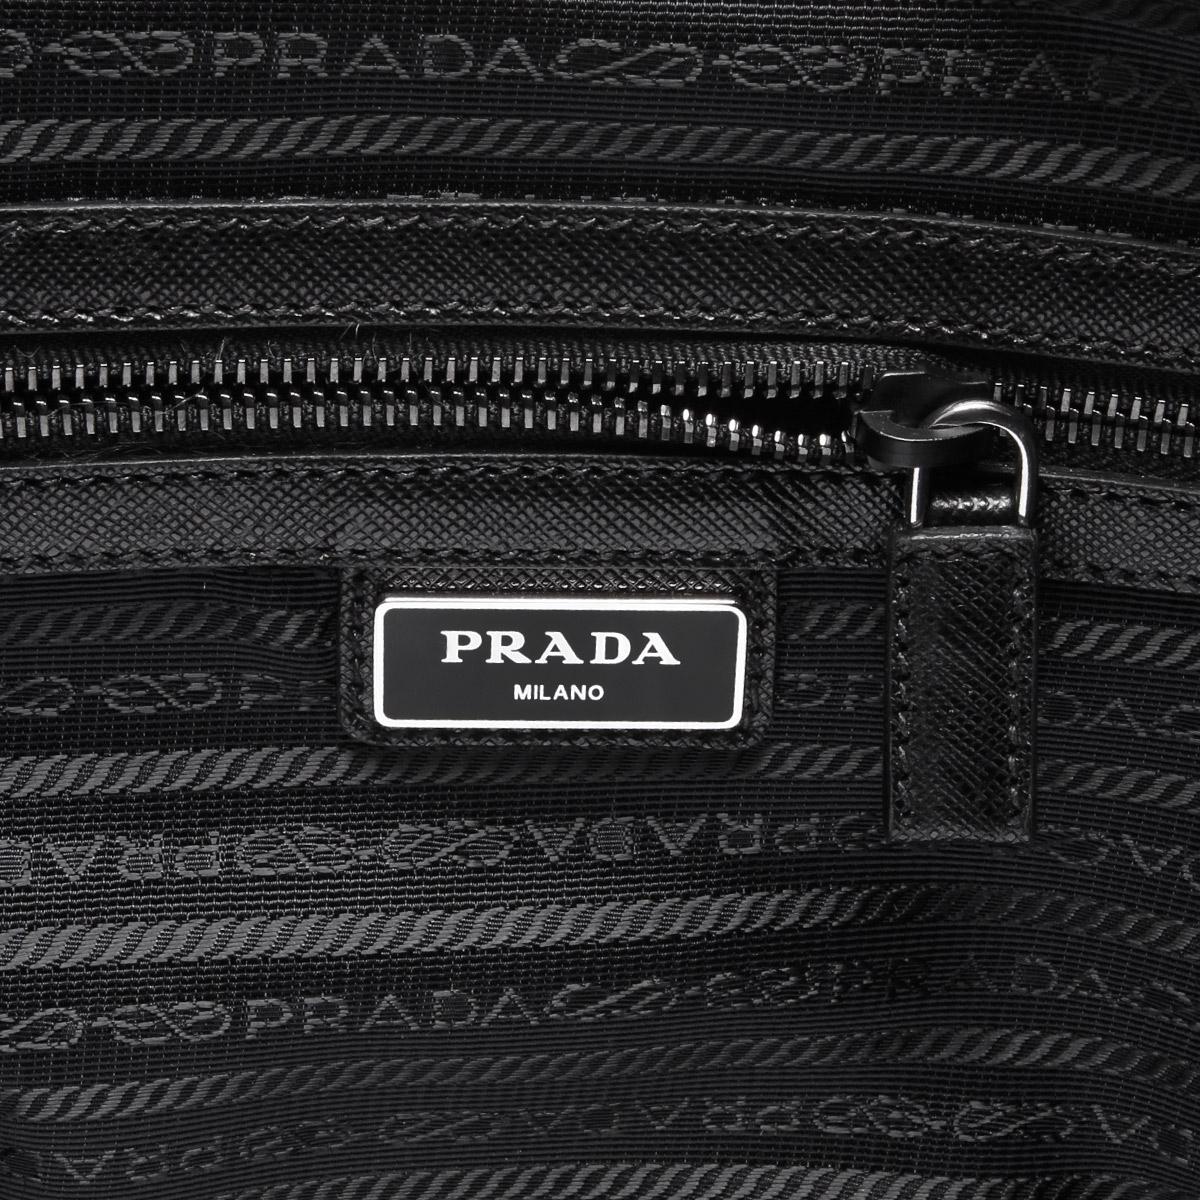 PRADA プラダ | ボストンバッグ